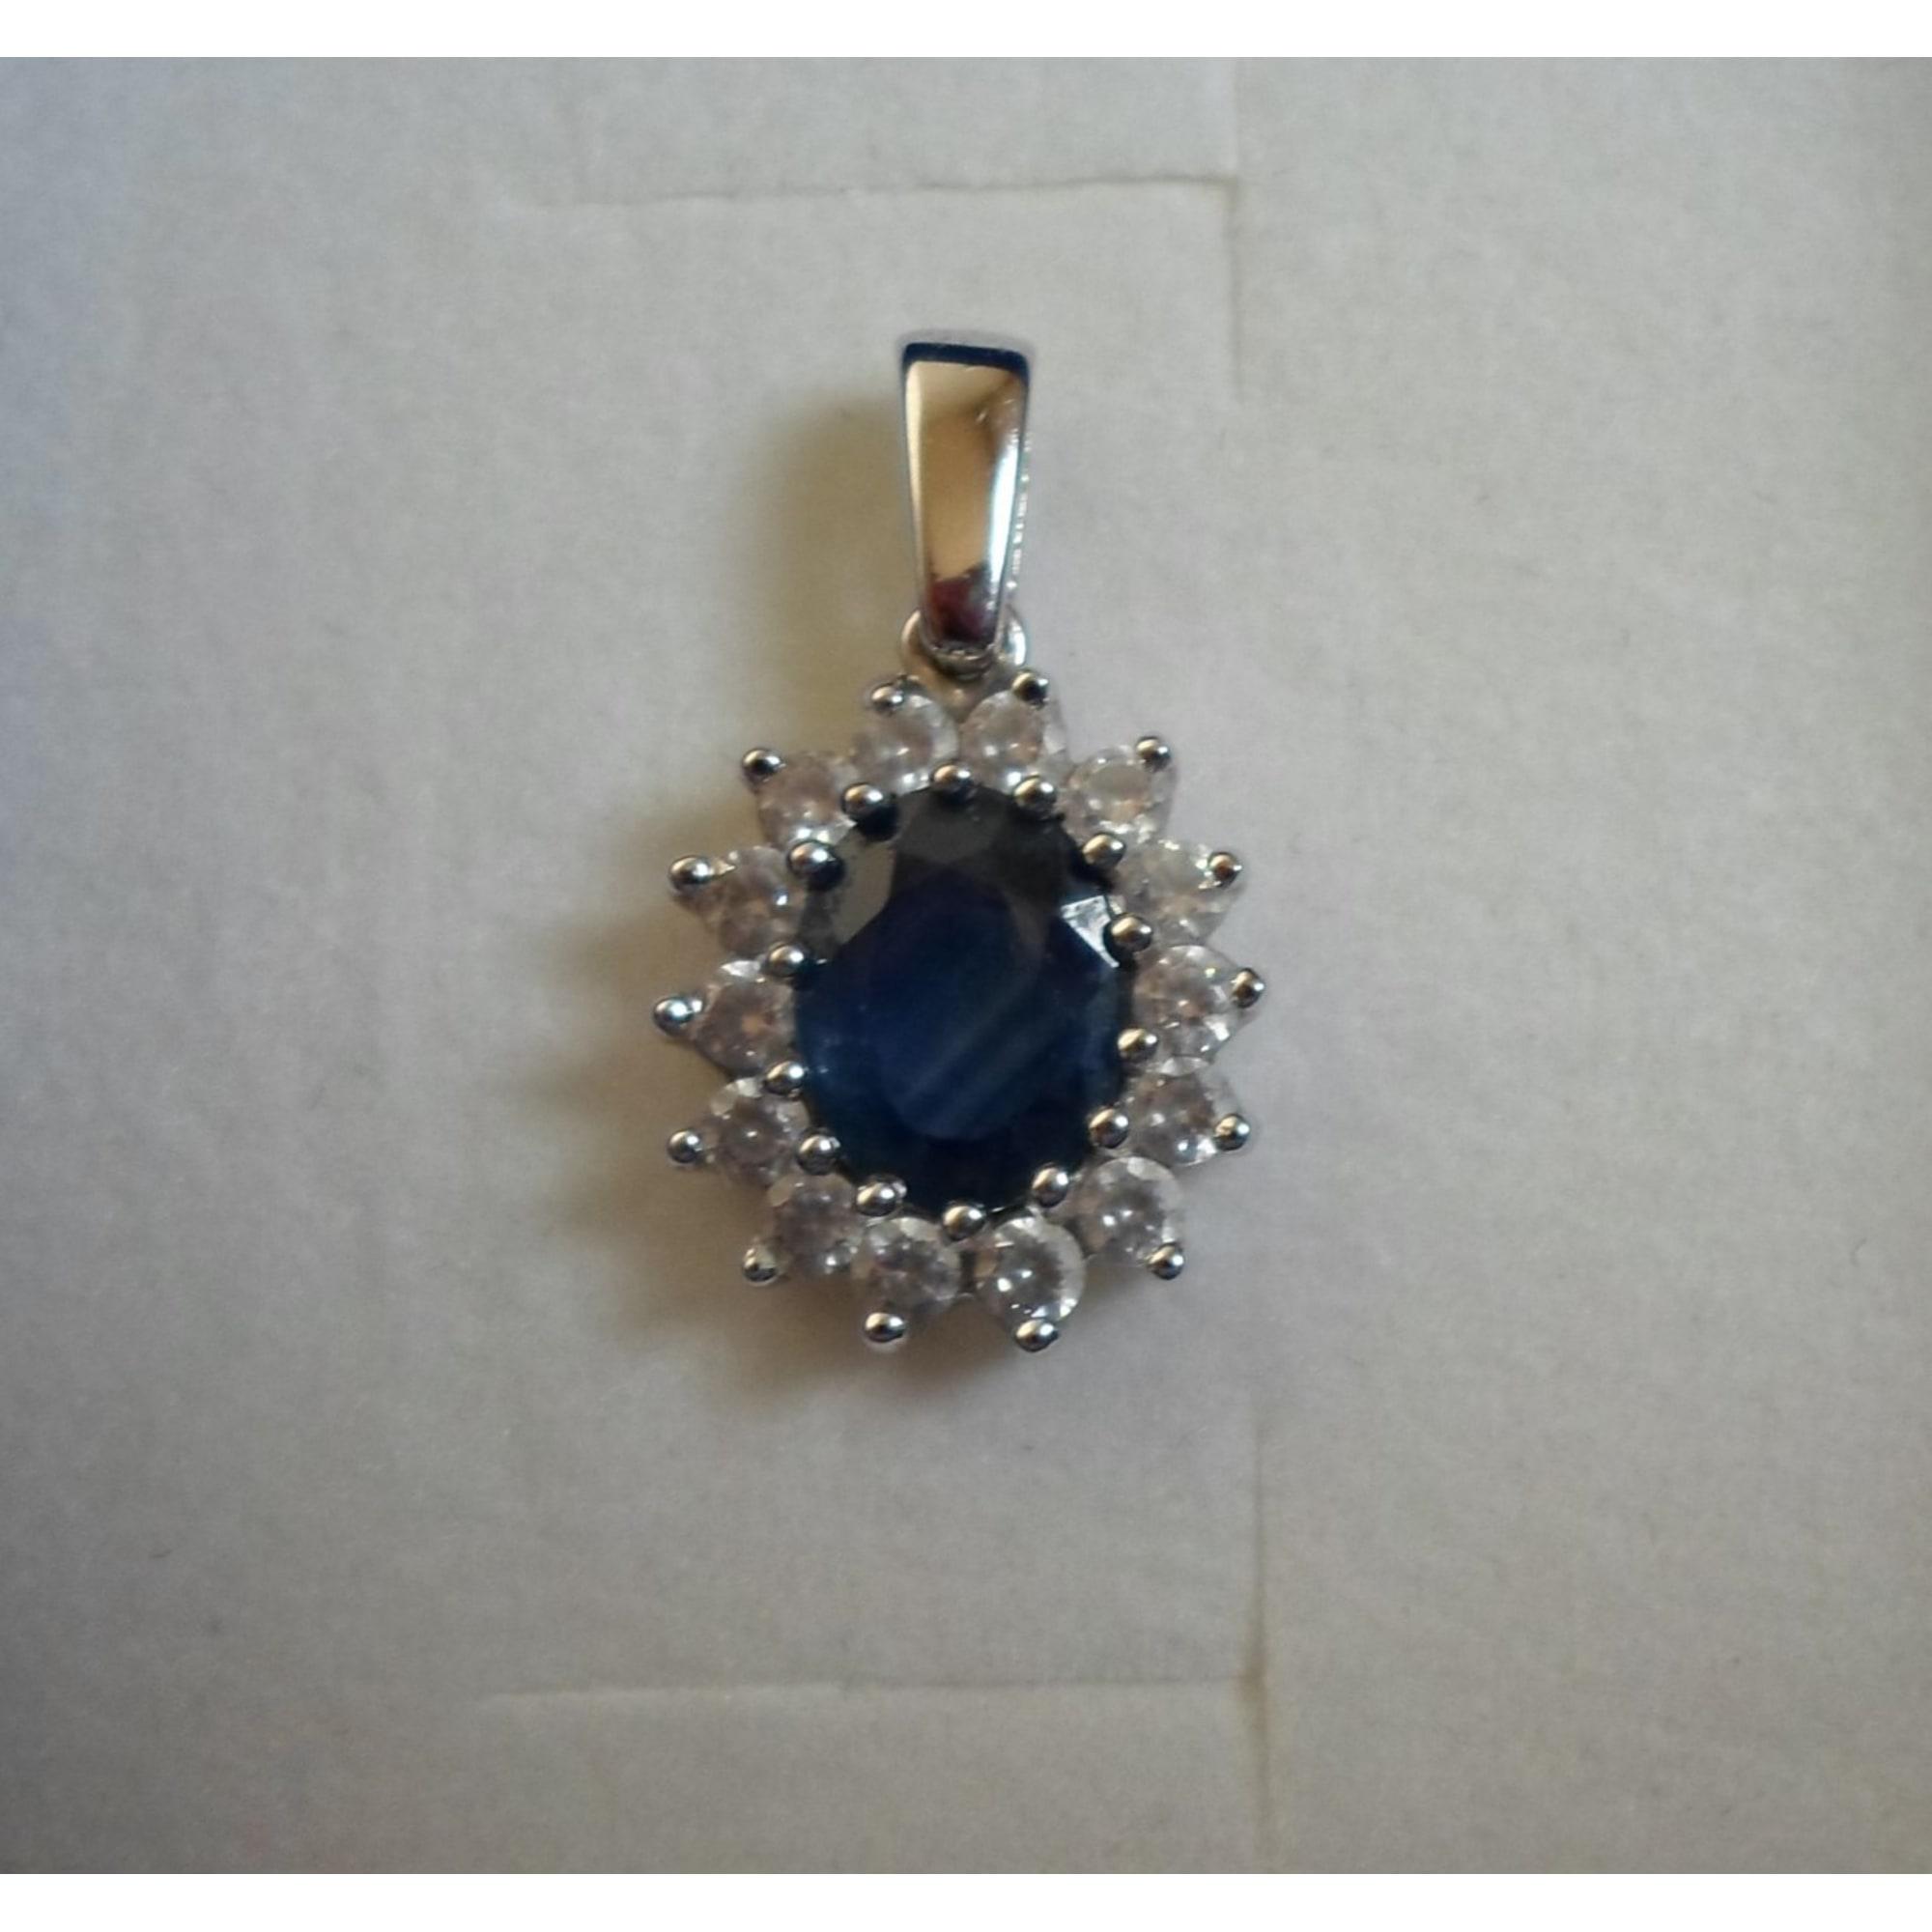 ramasser prix modéré à bas prix Pendentif, collier pendentif